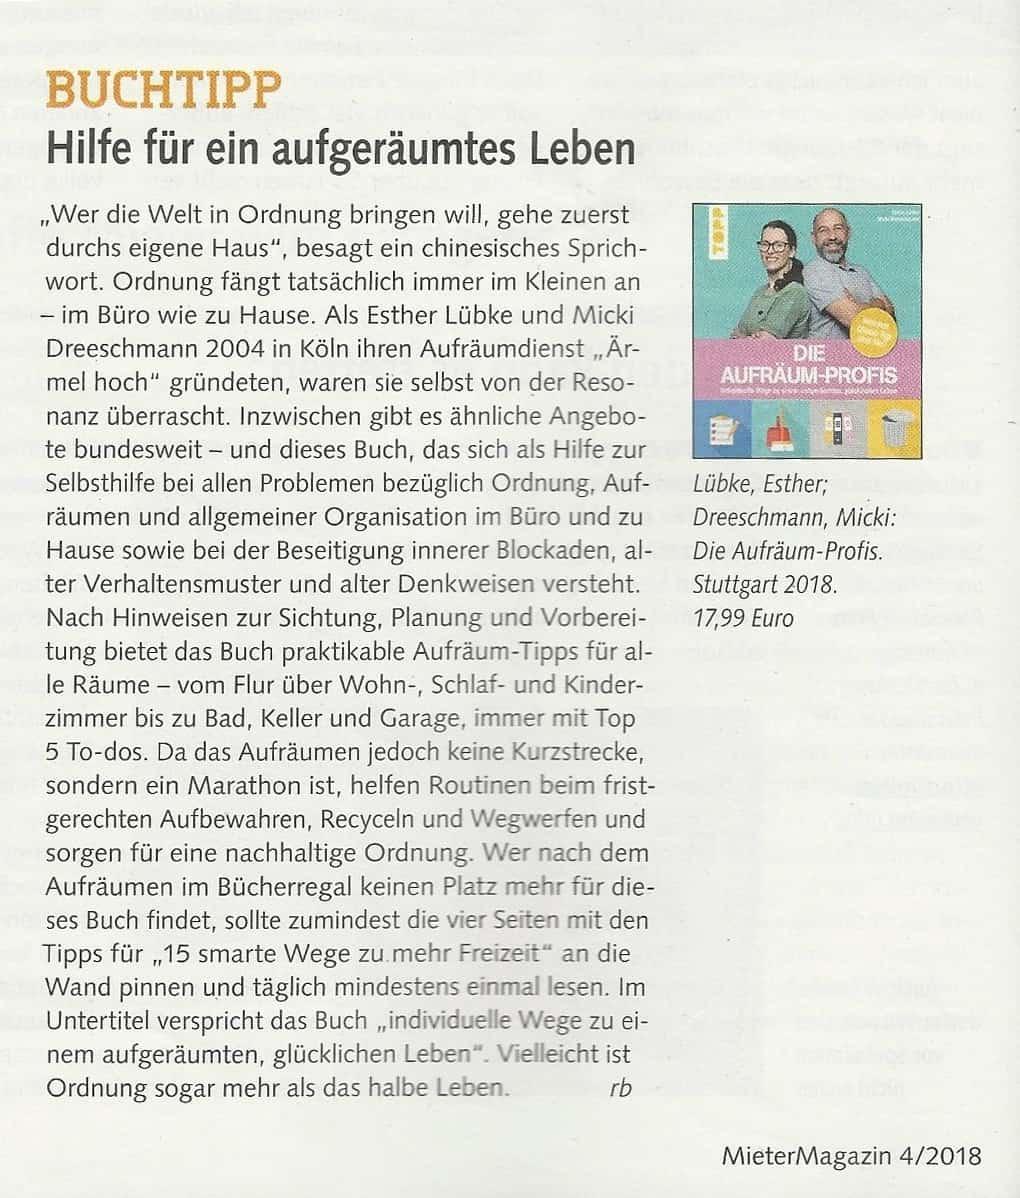 Mieter Magazin Berlin: April 2018